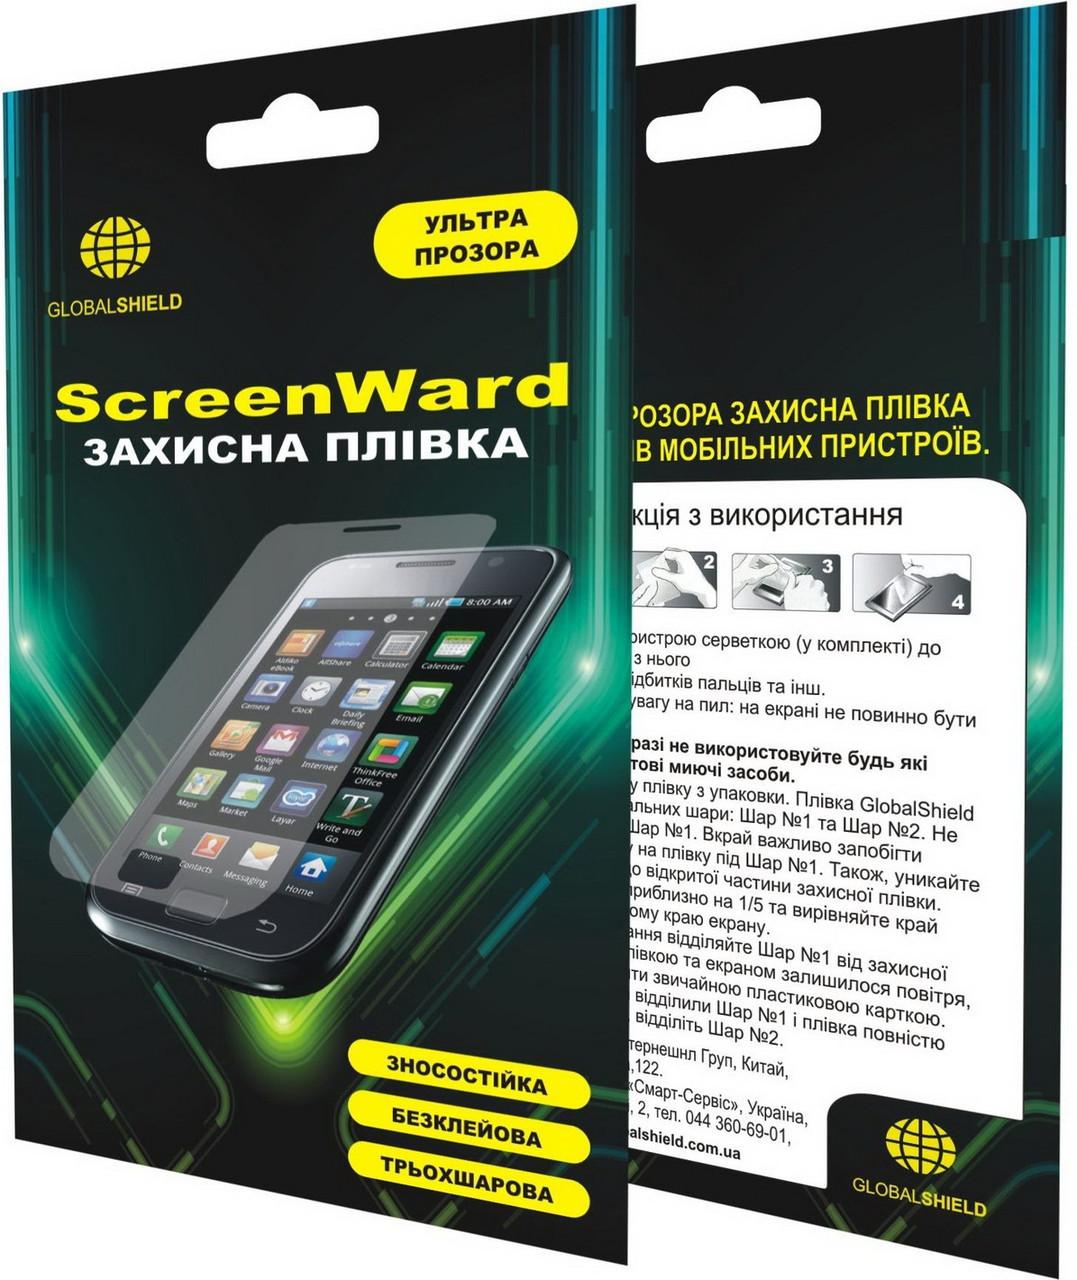 Защитная пленка GlobalShield ScreenWard for Apple iPhone 4 2in1 (1283126440250)